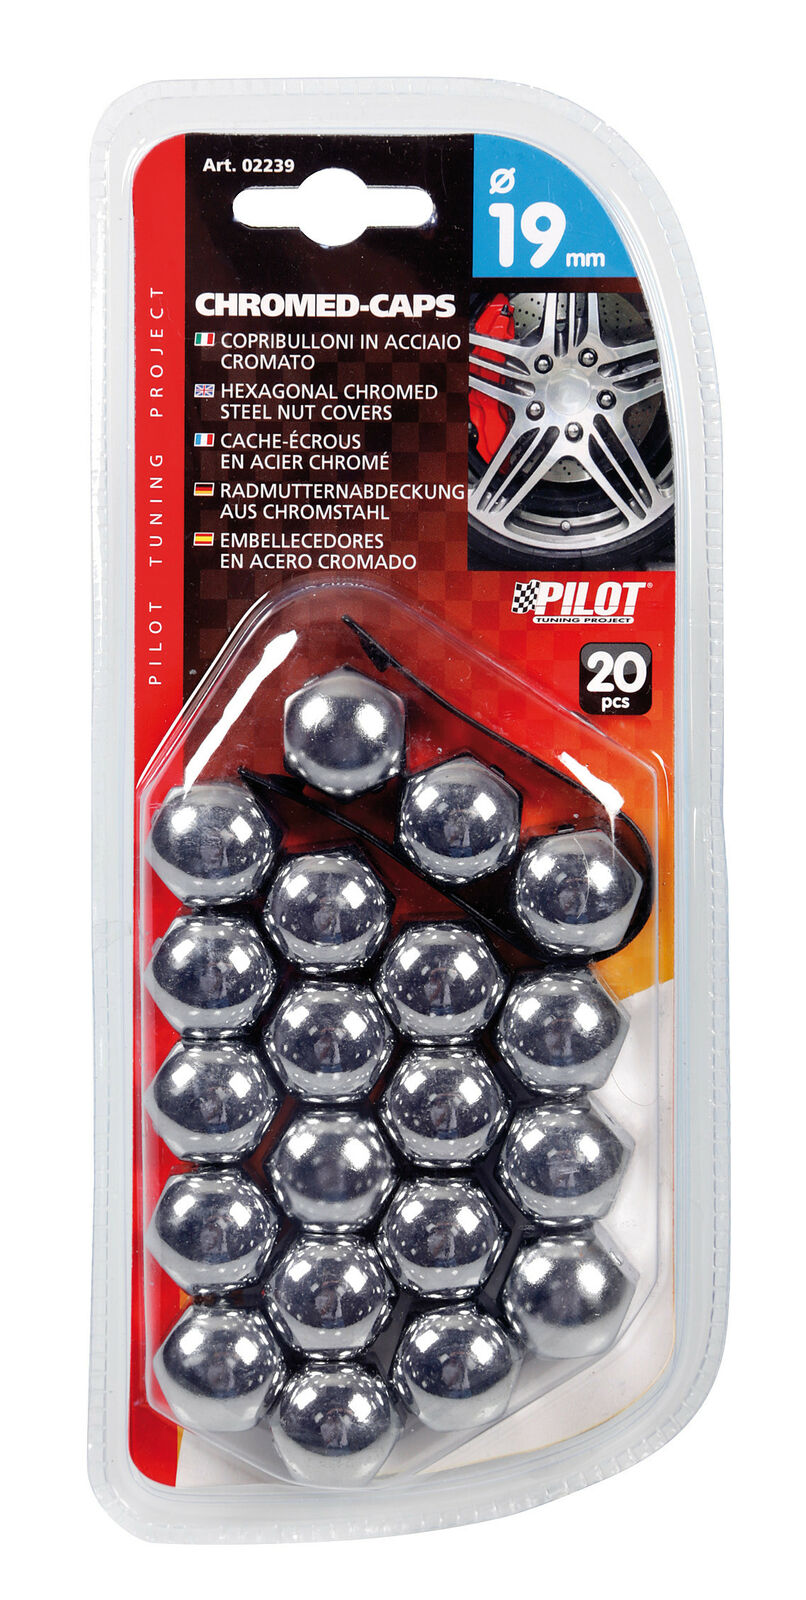 copribulloni in acciaio cromato Ø 19 mm Chromed Caps